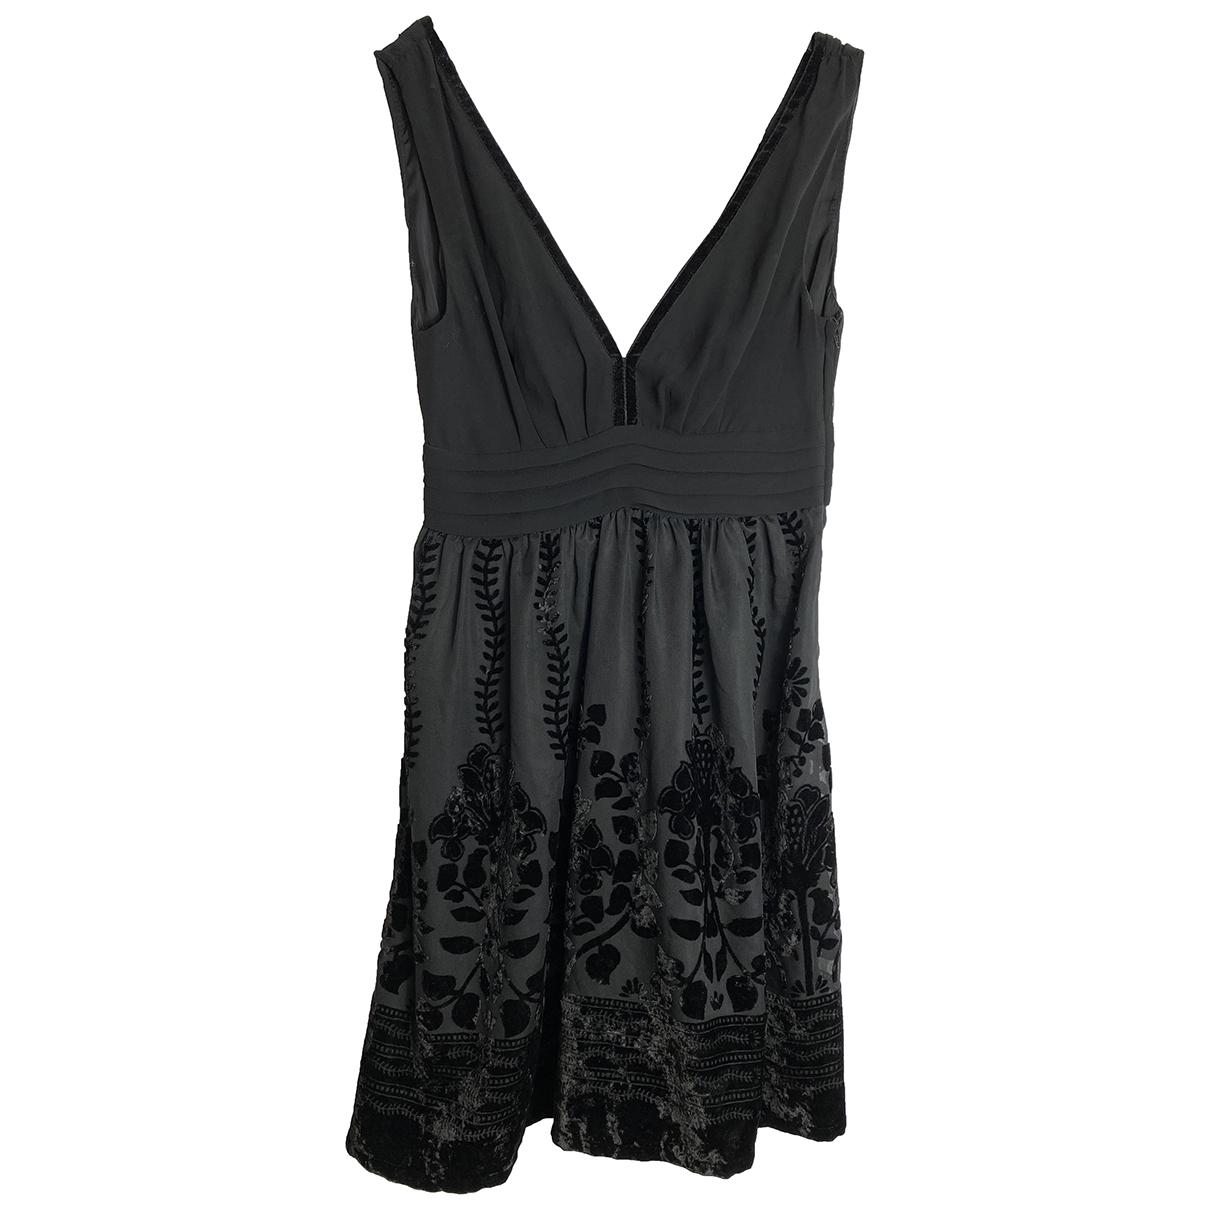 Hm Conscious Exclusive \N Kleid in  Schwarz Polyester